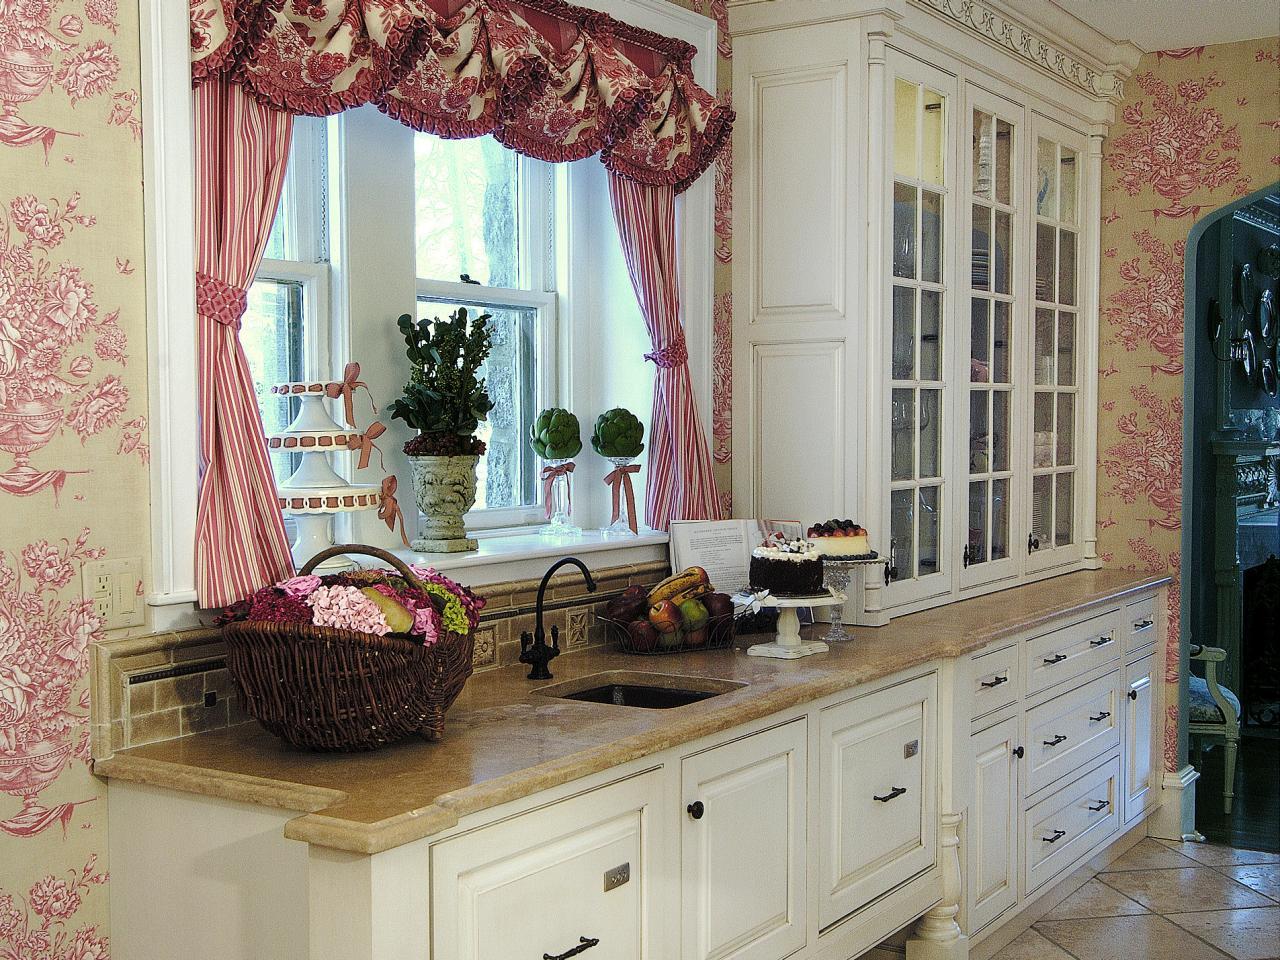 dise o de cocinas shabby chic abra paso a la dulzura. Black Bedroom Furniture Sets. Home Design Ideas